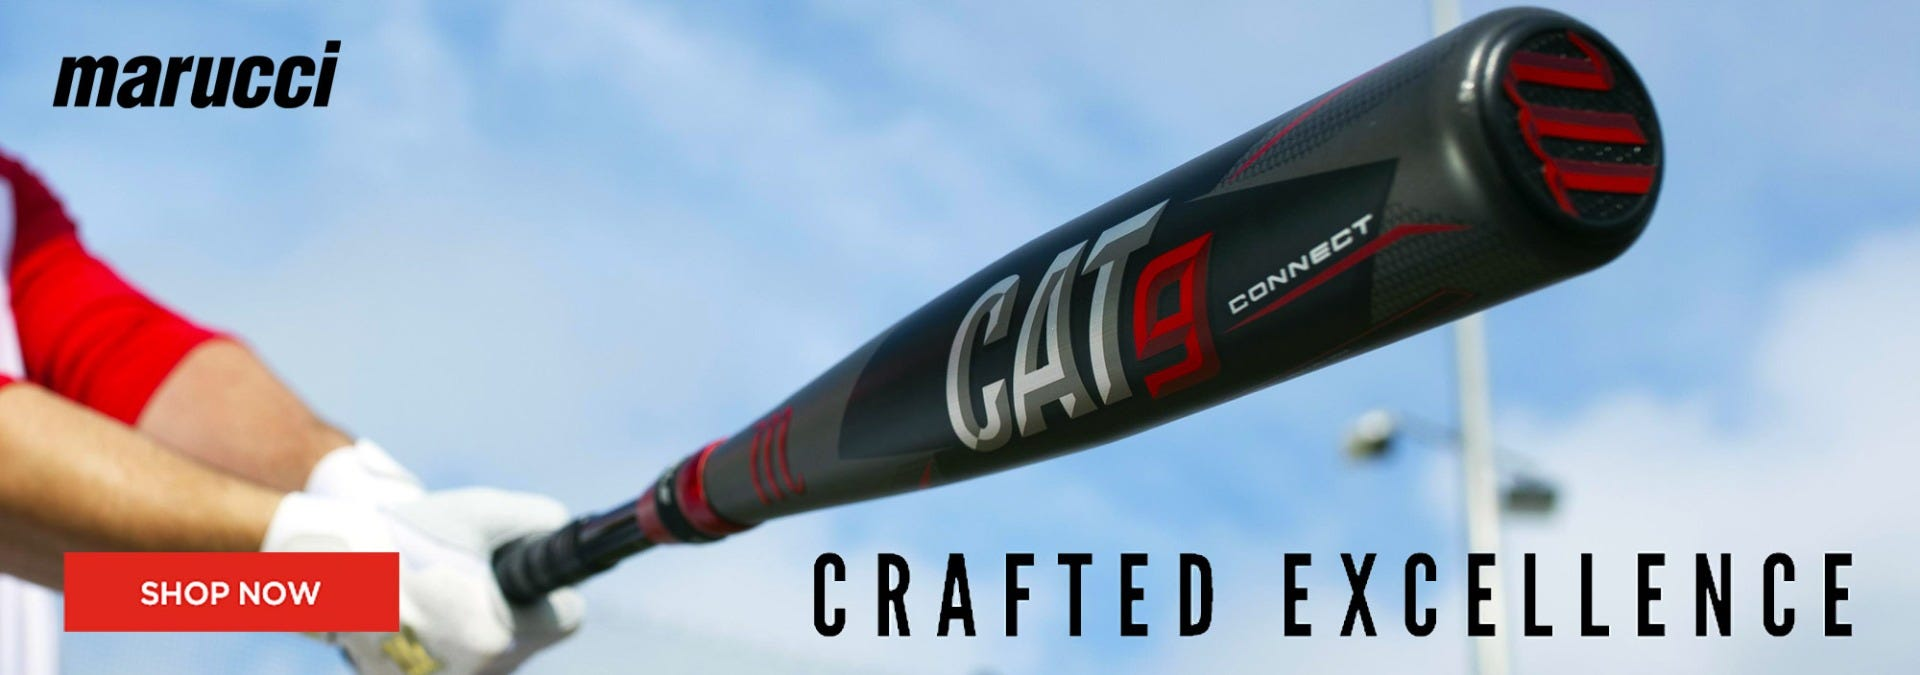 New Cat9 Baseball Bats From Marucci